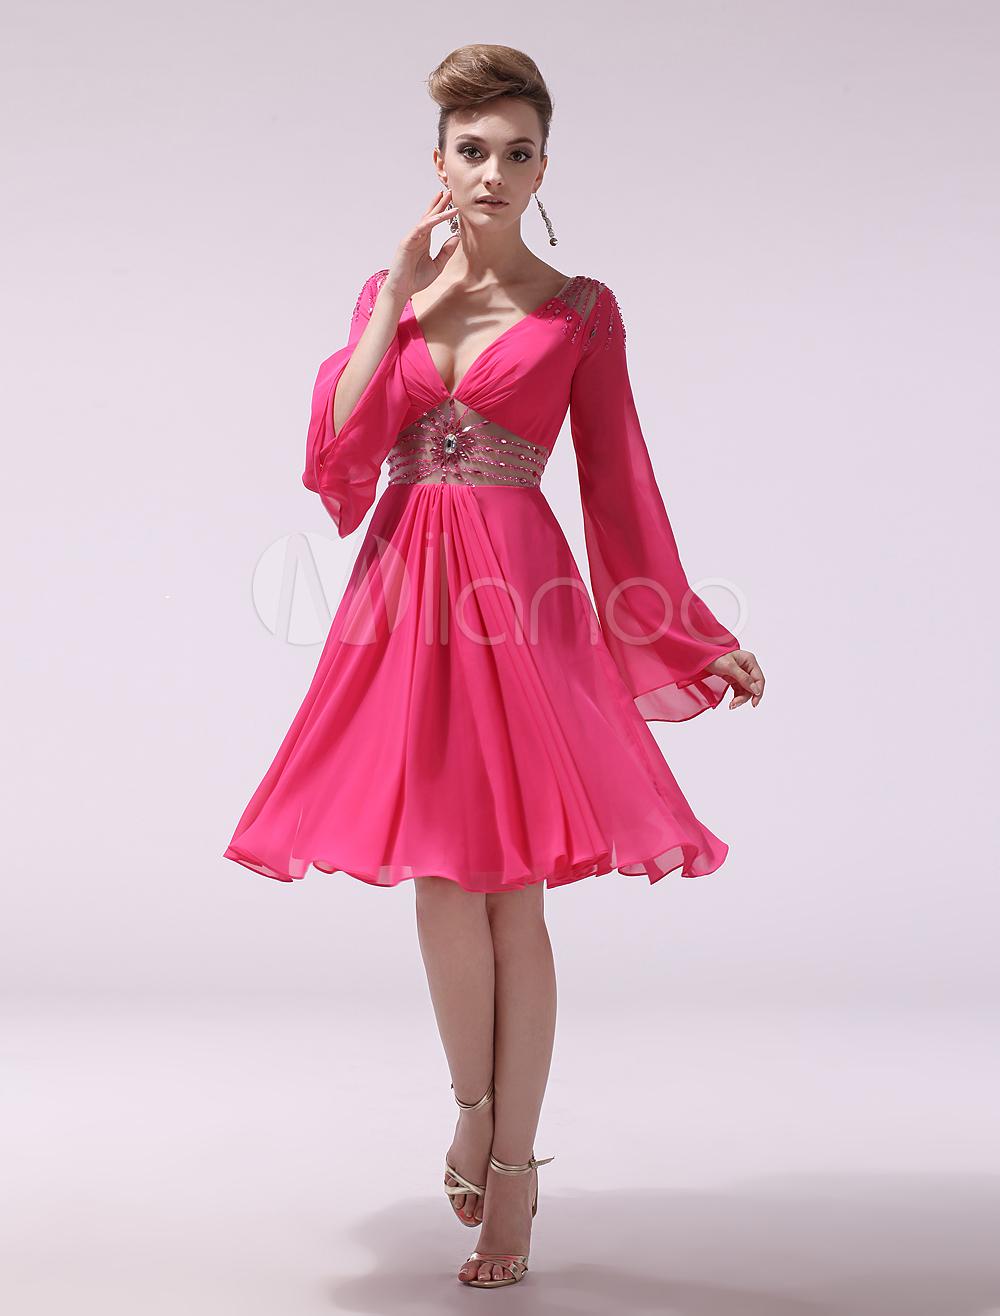 Chiffon Cocktail Dress Hot Pink V Neck Prom Dress Beaded Long Sleeve Pleated Short Party Dress Milanoo (Wedding Cocktail Dresses) photo